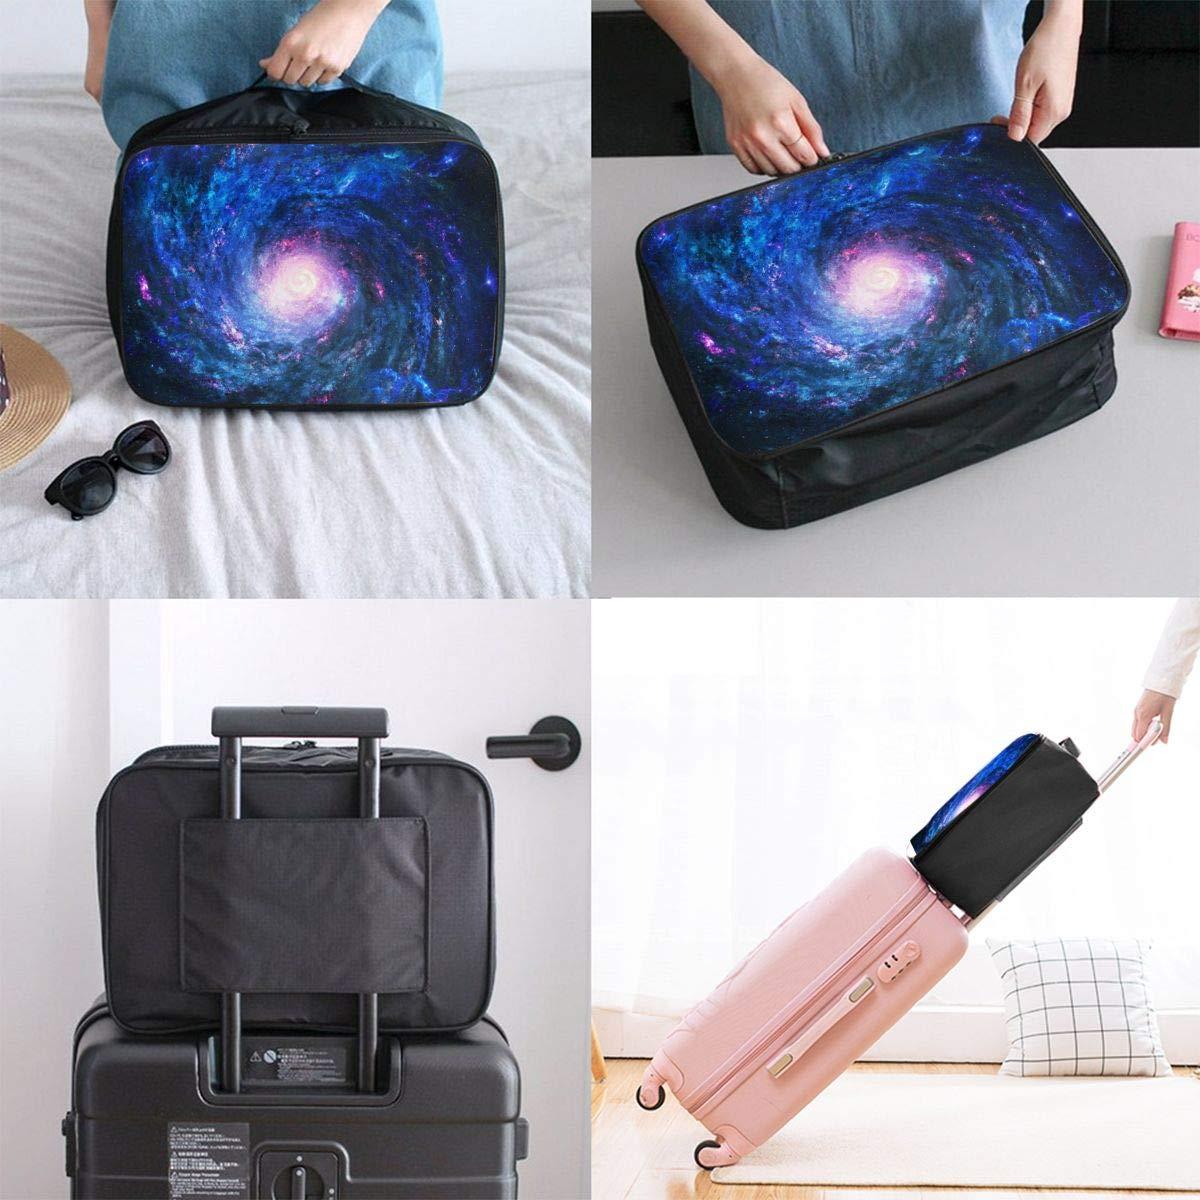 ADGAI Milky Way Series 3 Canvas Travel Weekender Bag,Fashion Custom Lightweight Large Capacity Portable Luggage Bag,Suitcase Trolley Bag